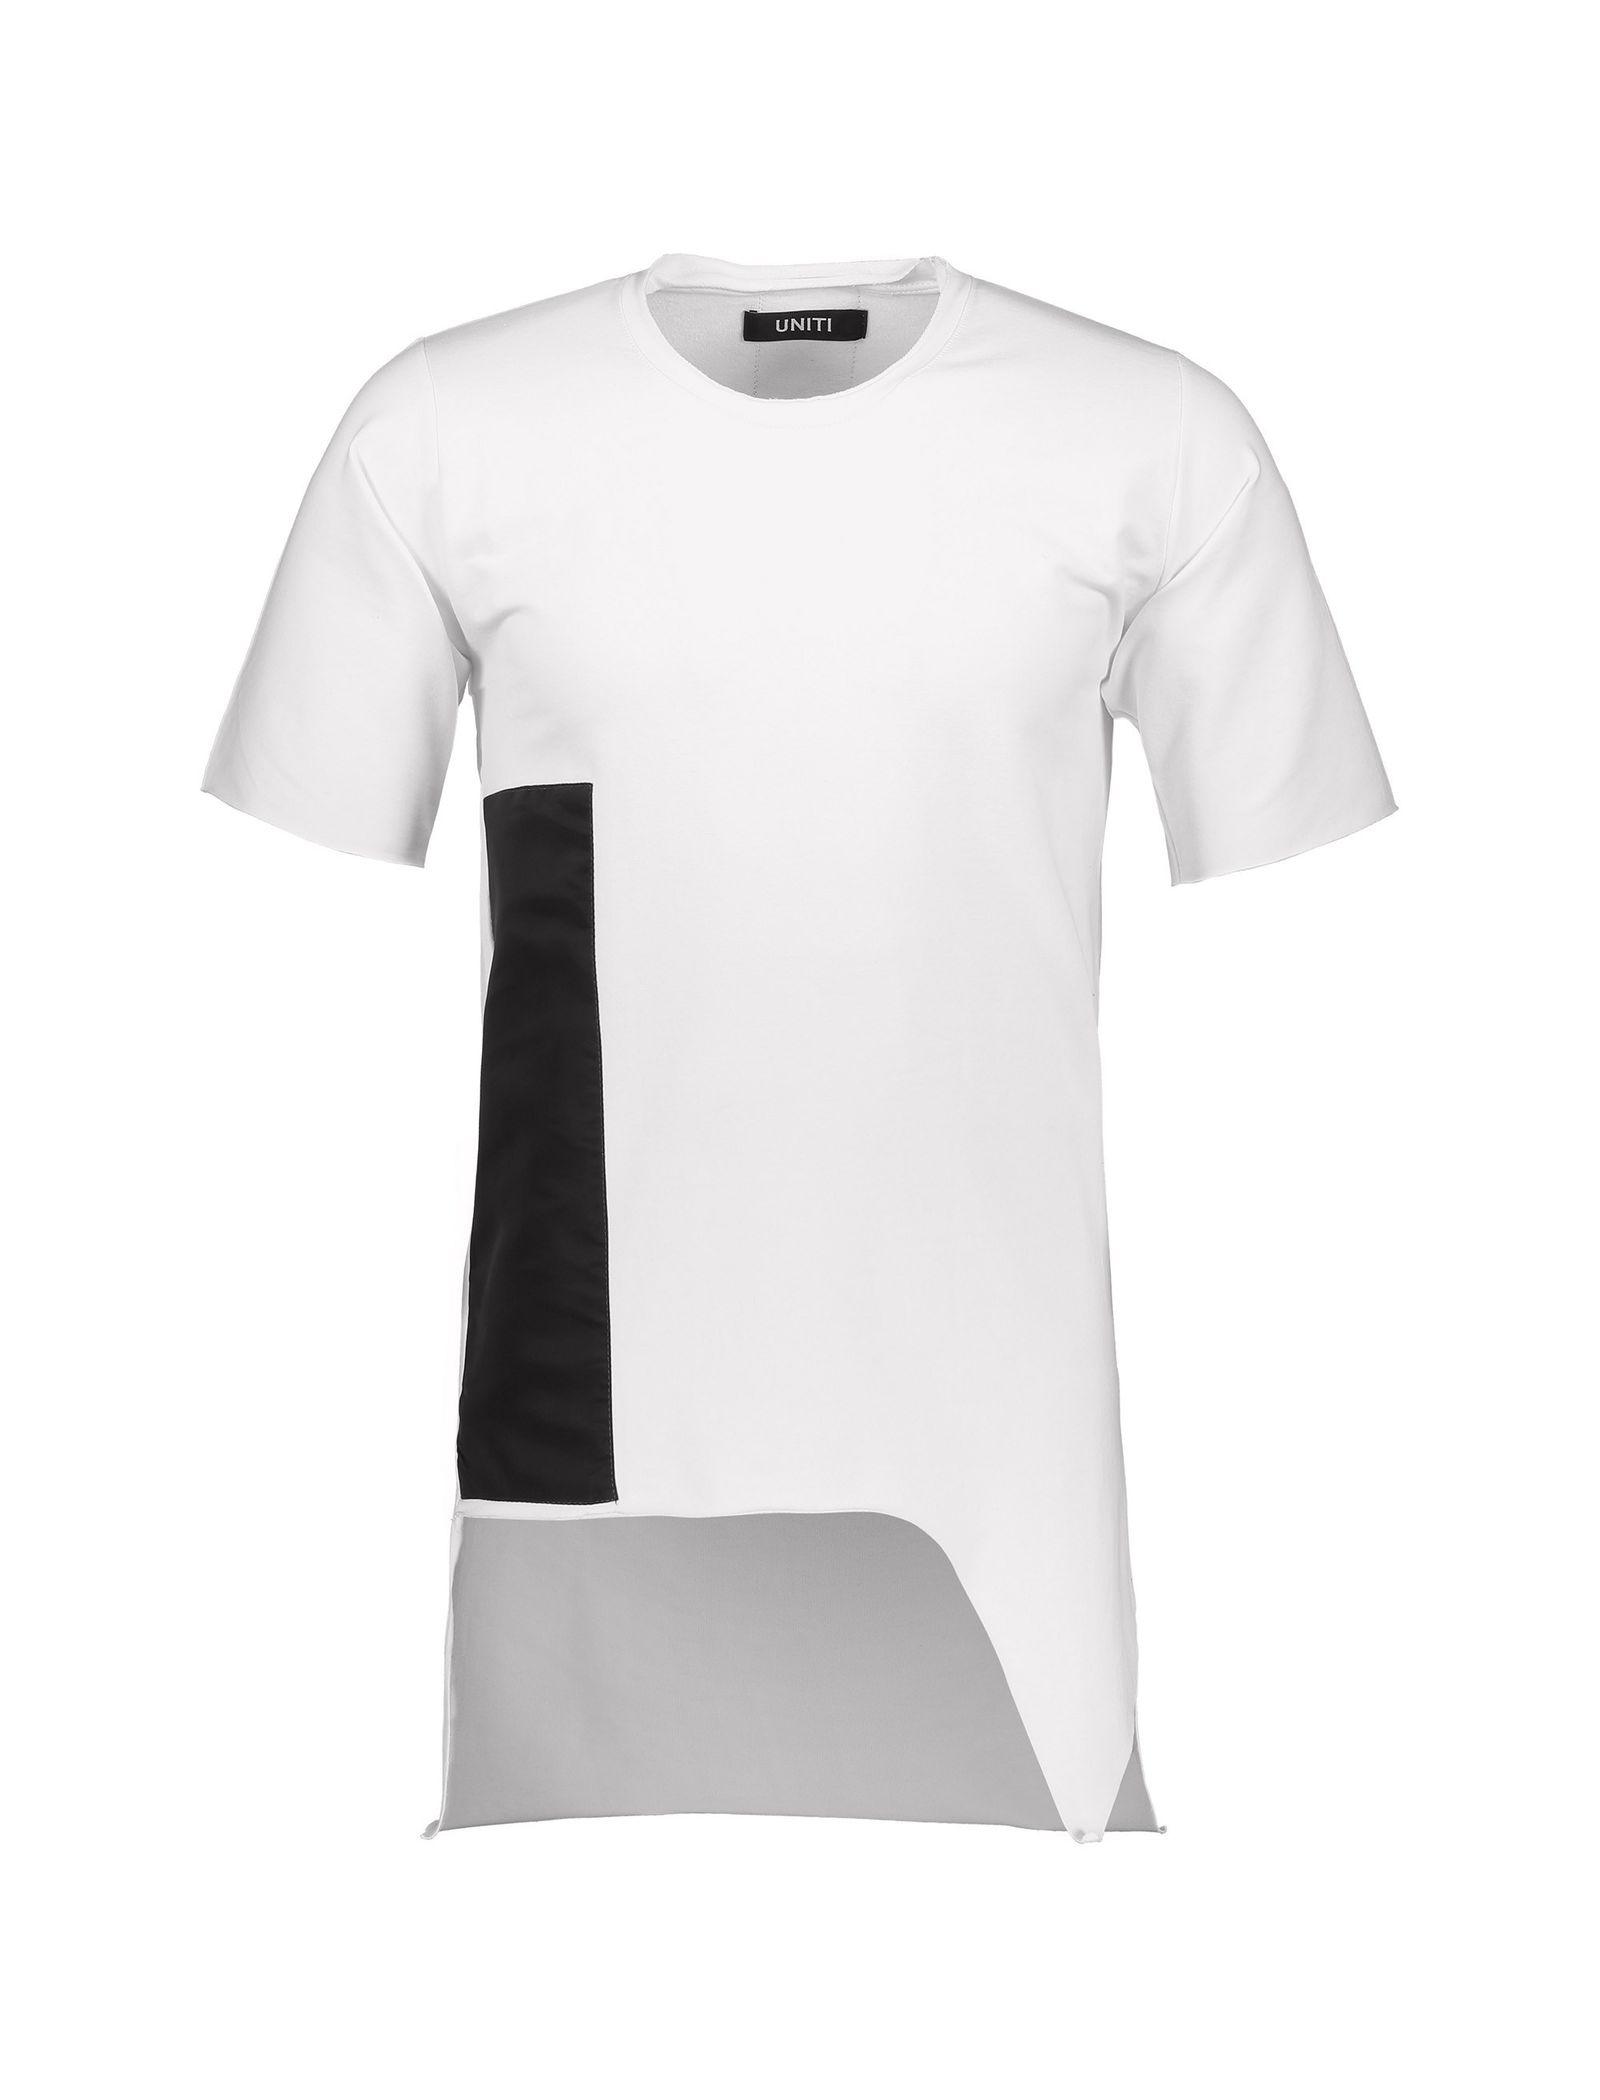 تی شرت ویسکوز یقه گرد مردانه Memory - یونیتی - سفيد - 1